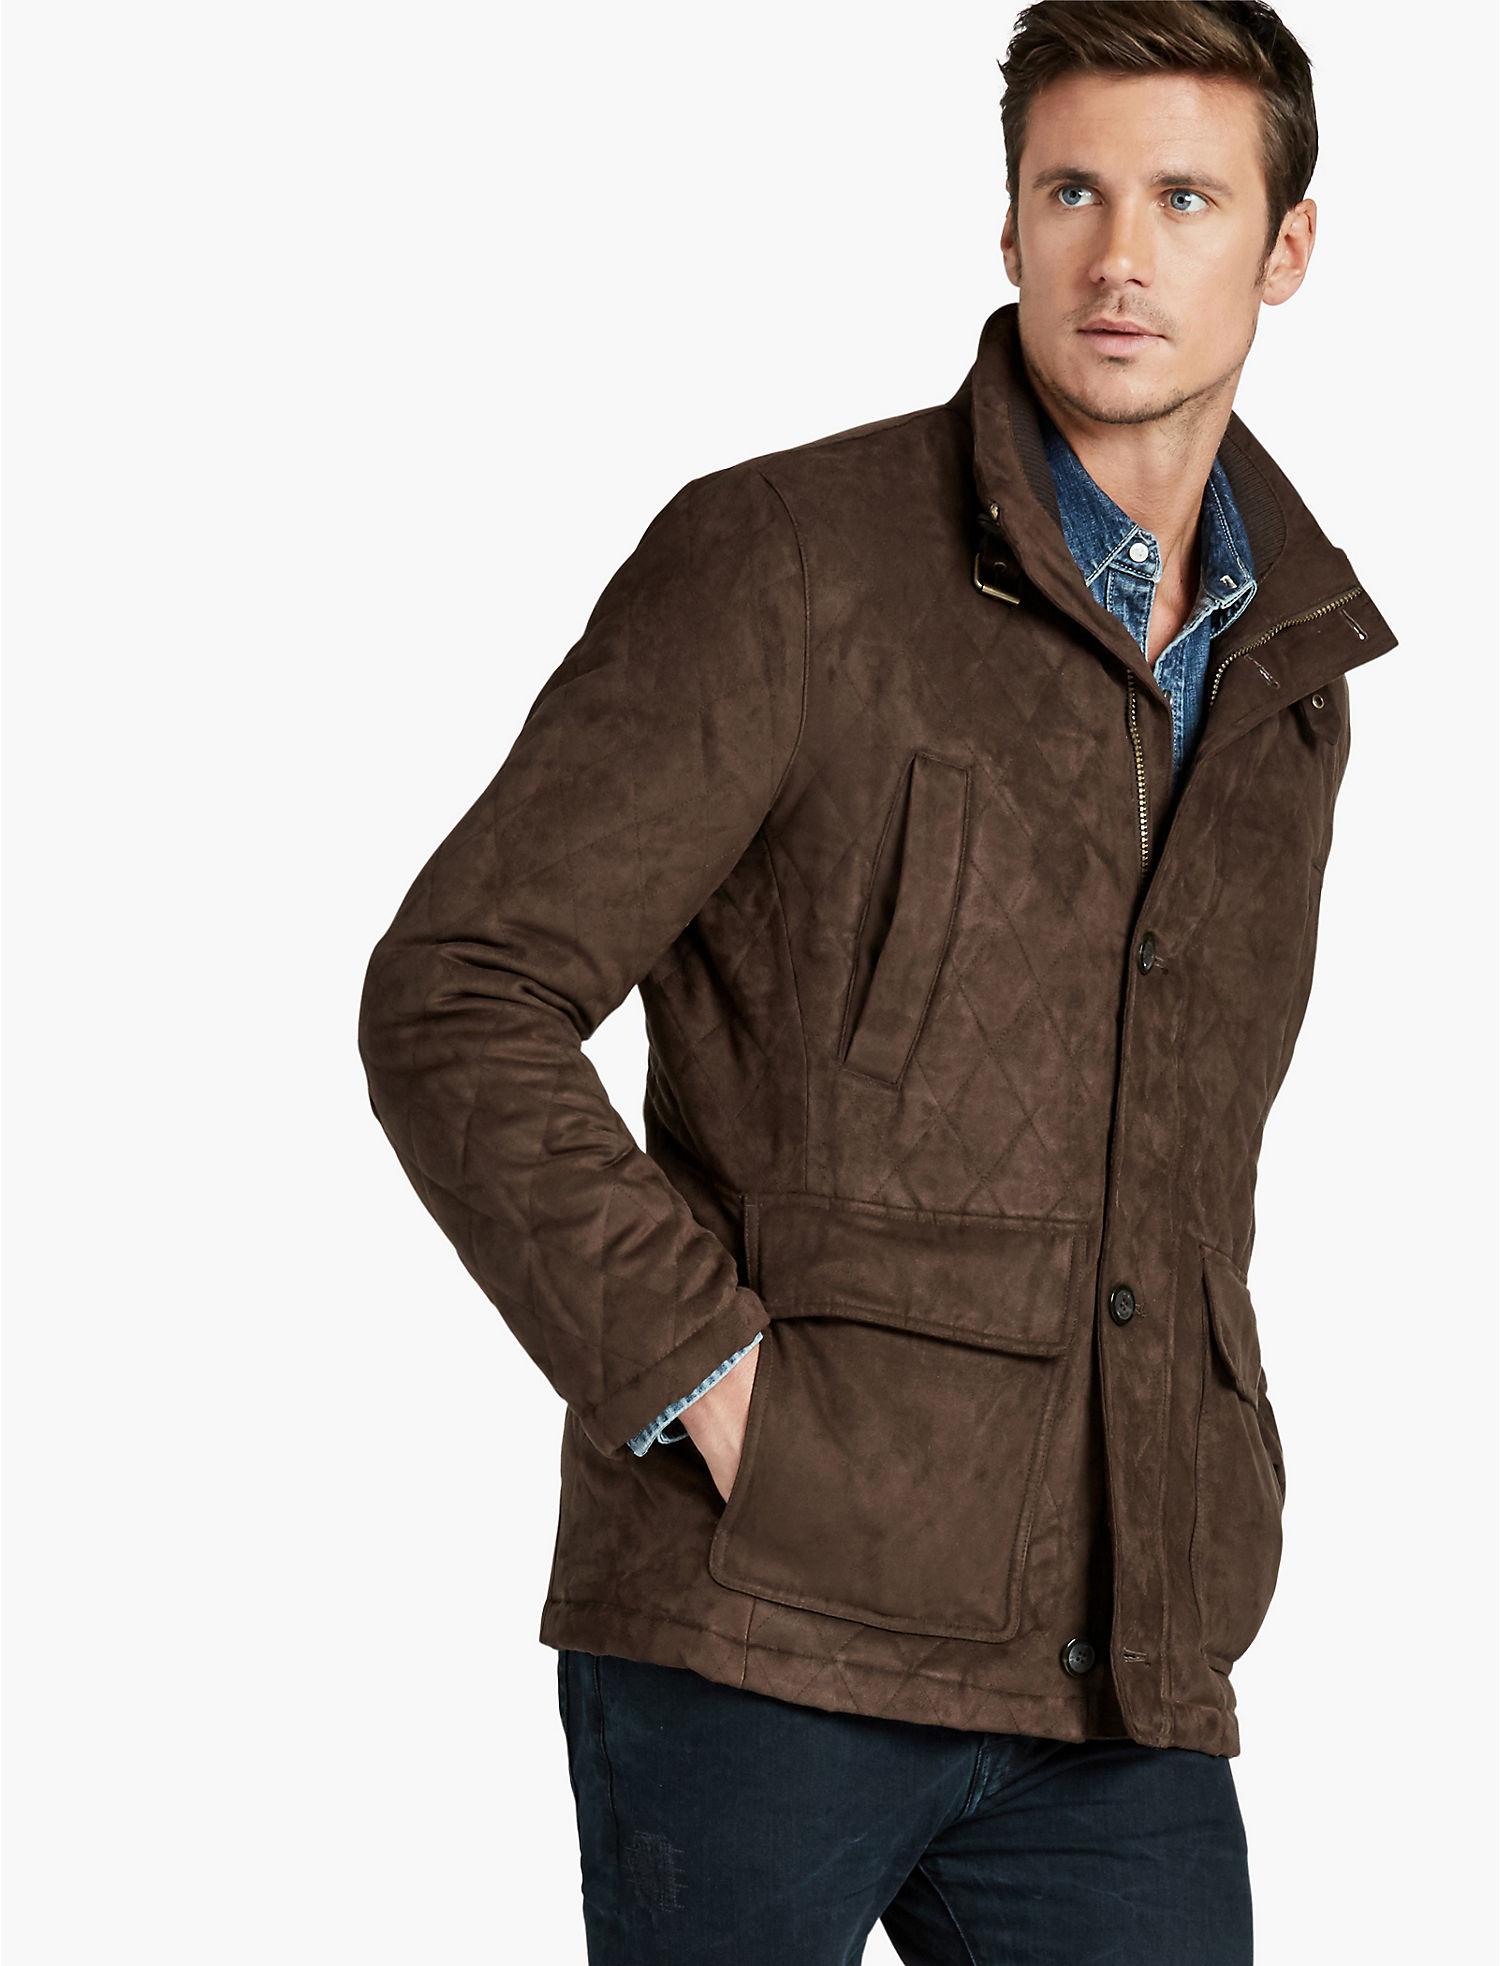 Mens Quilted Jacket | Lucky Brand : men quilted coat - Adamdwight.com